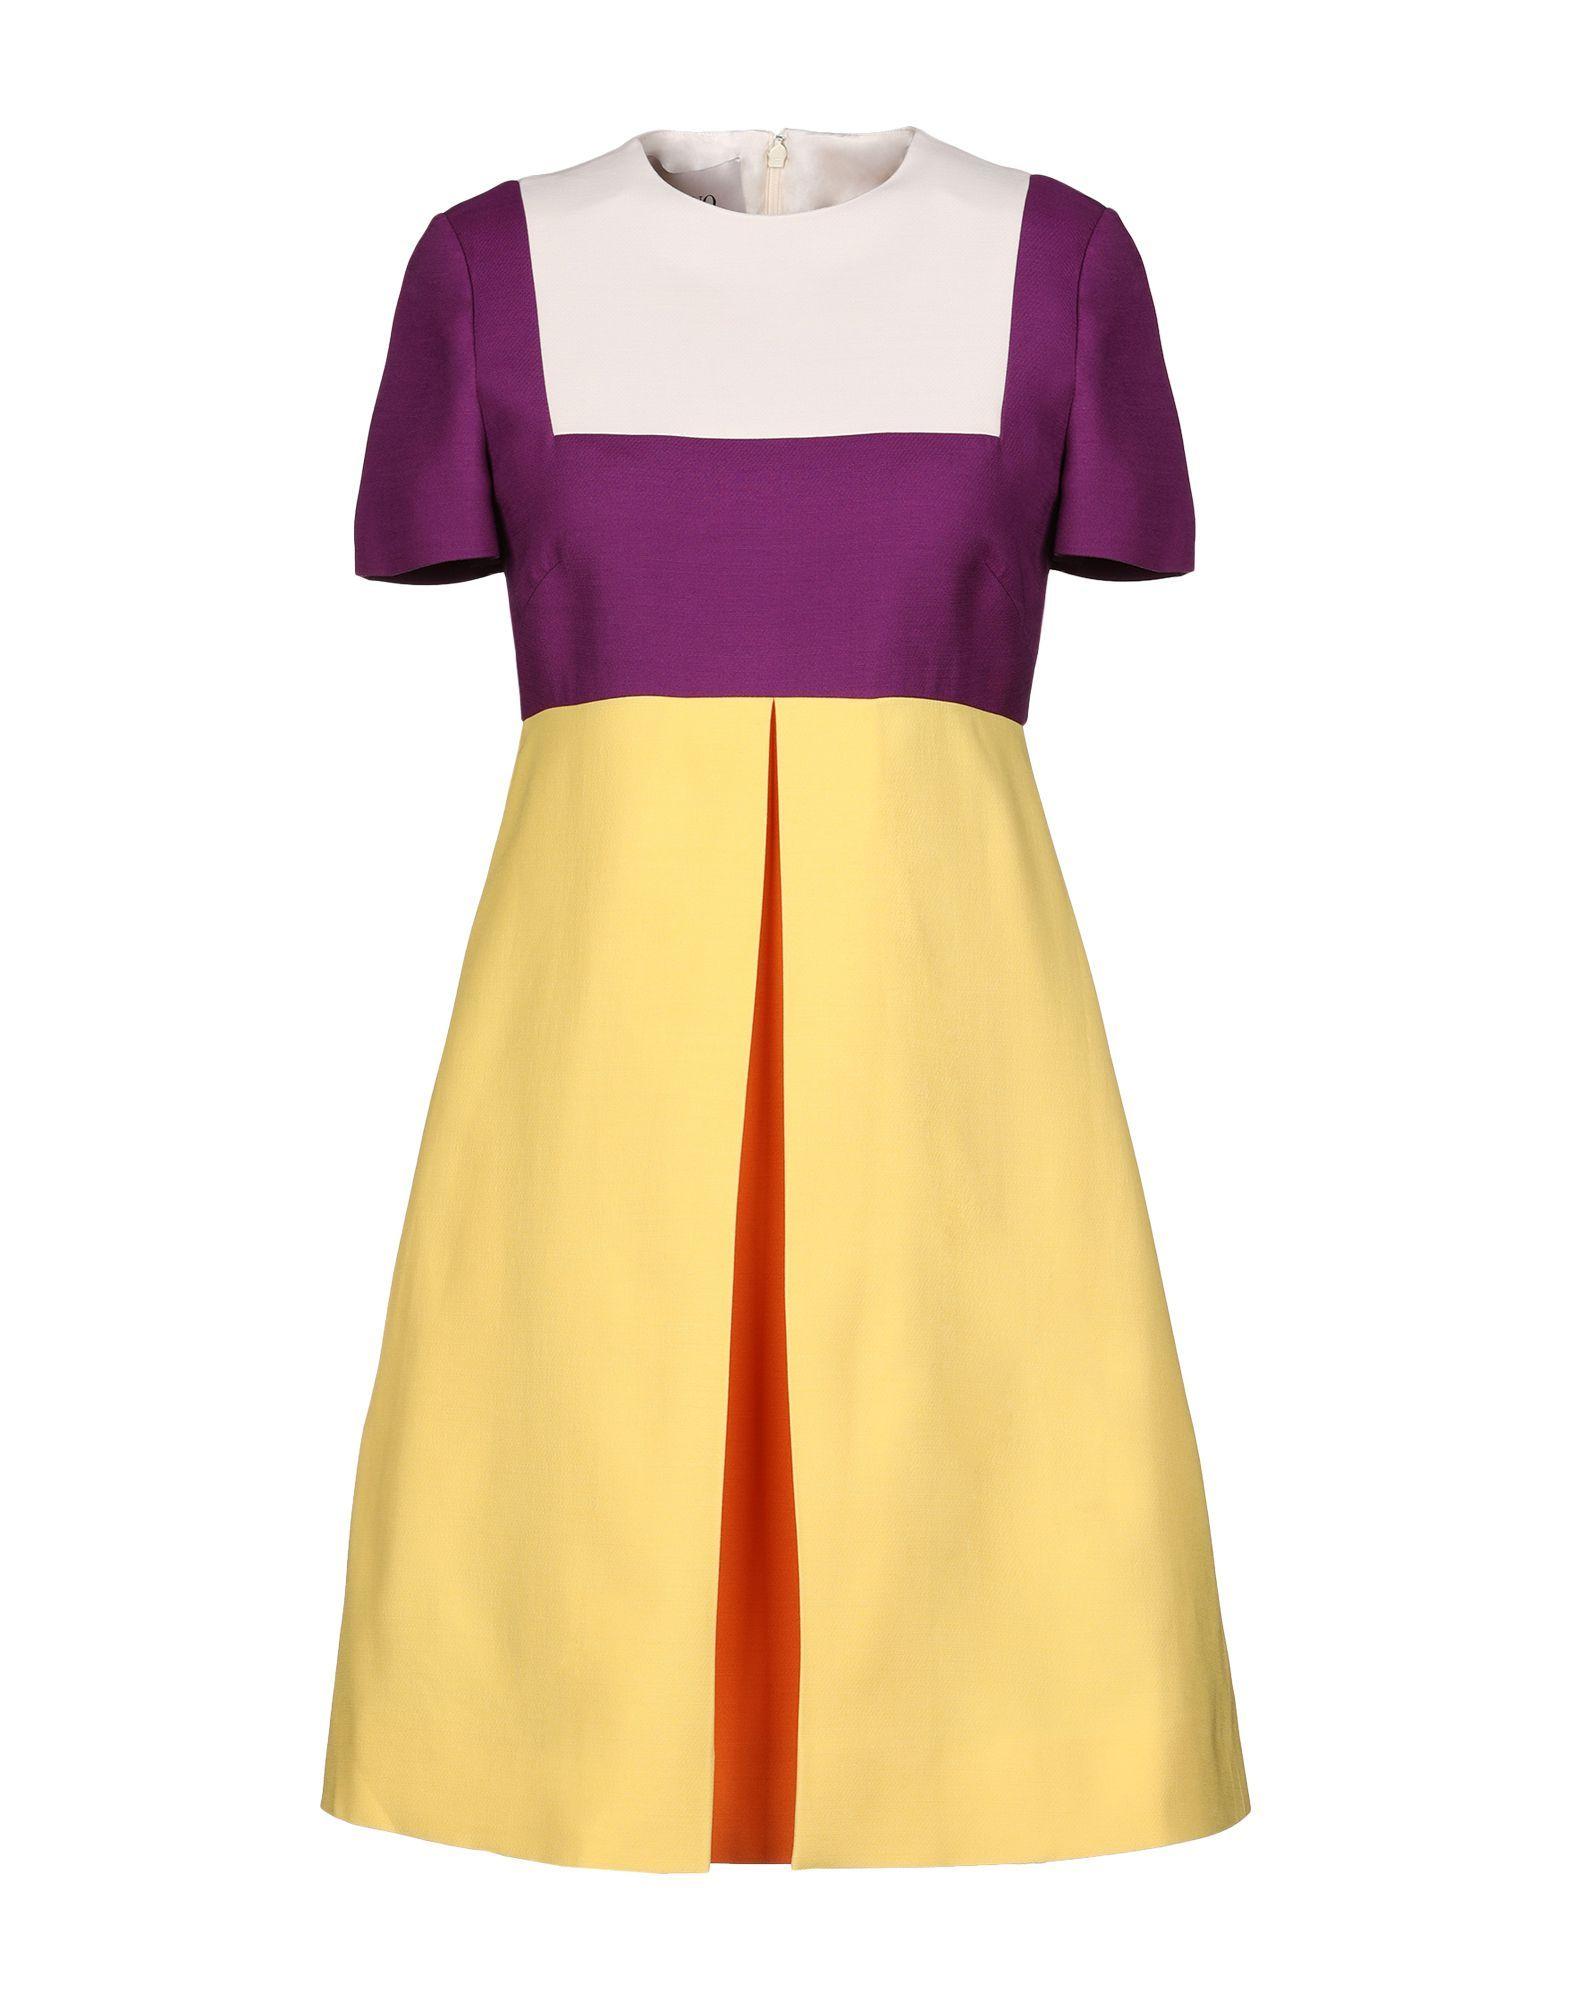 Valentino Purple Colourblock Wool Short Sleeve Dress